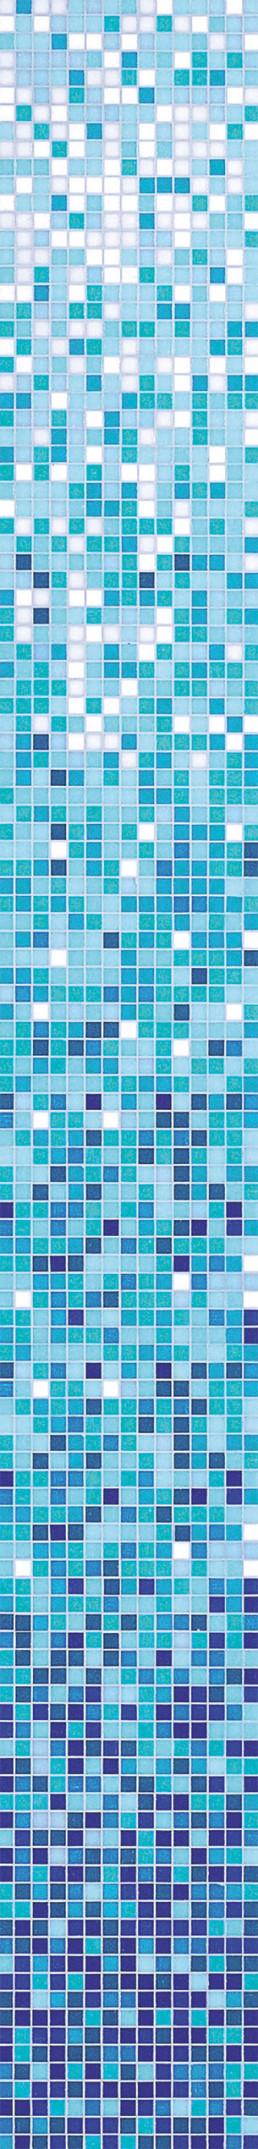 ORTENSIA Mosaic Shading Blend